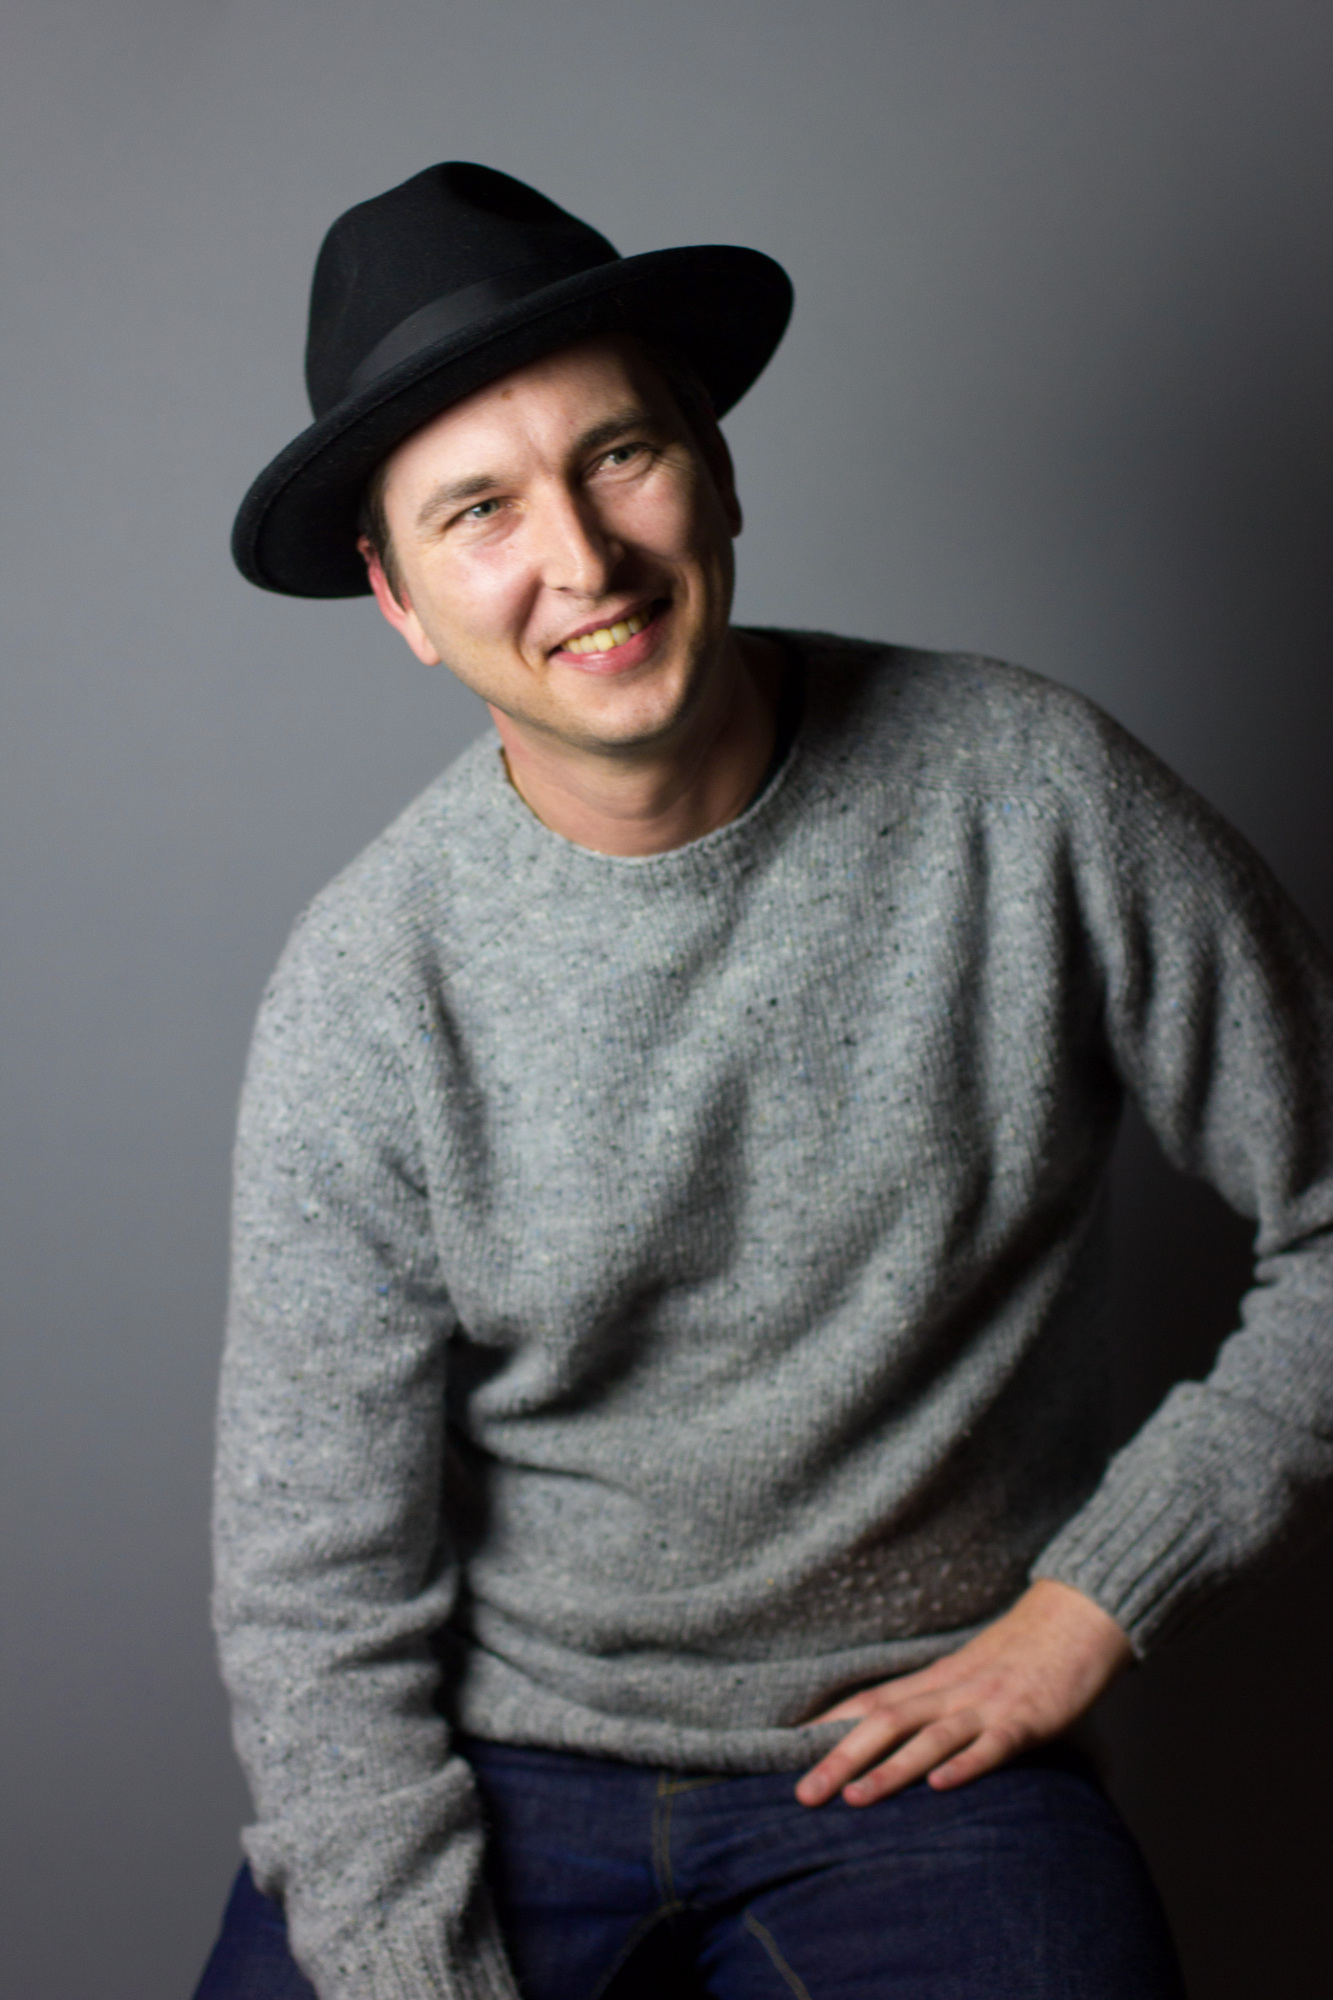 Jason Silen of Goorin Bros Hat Shop Rittenhouse in Brimmed Hats